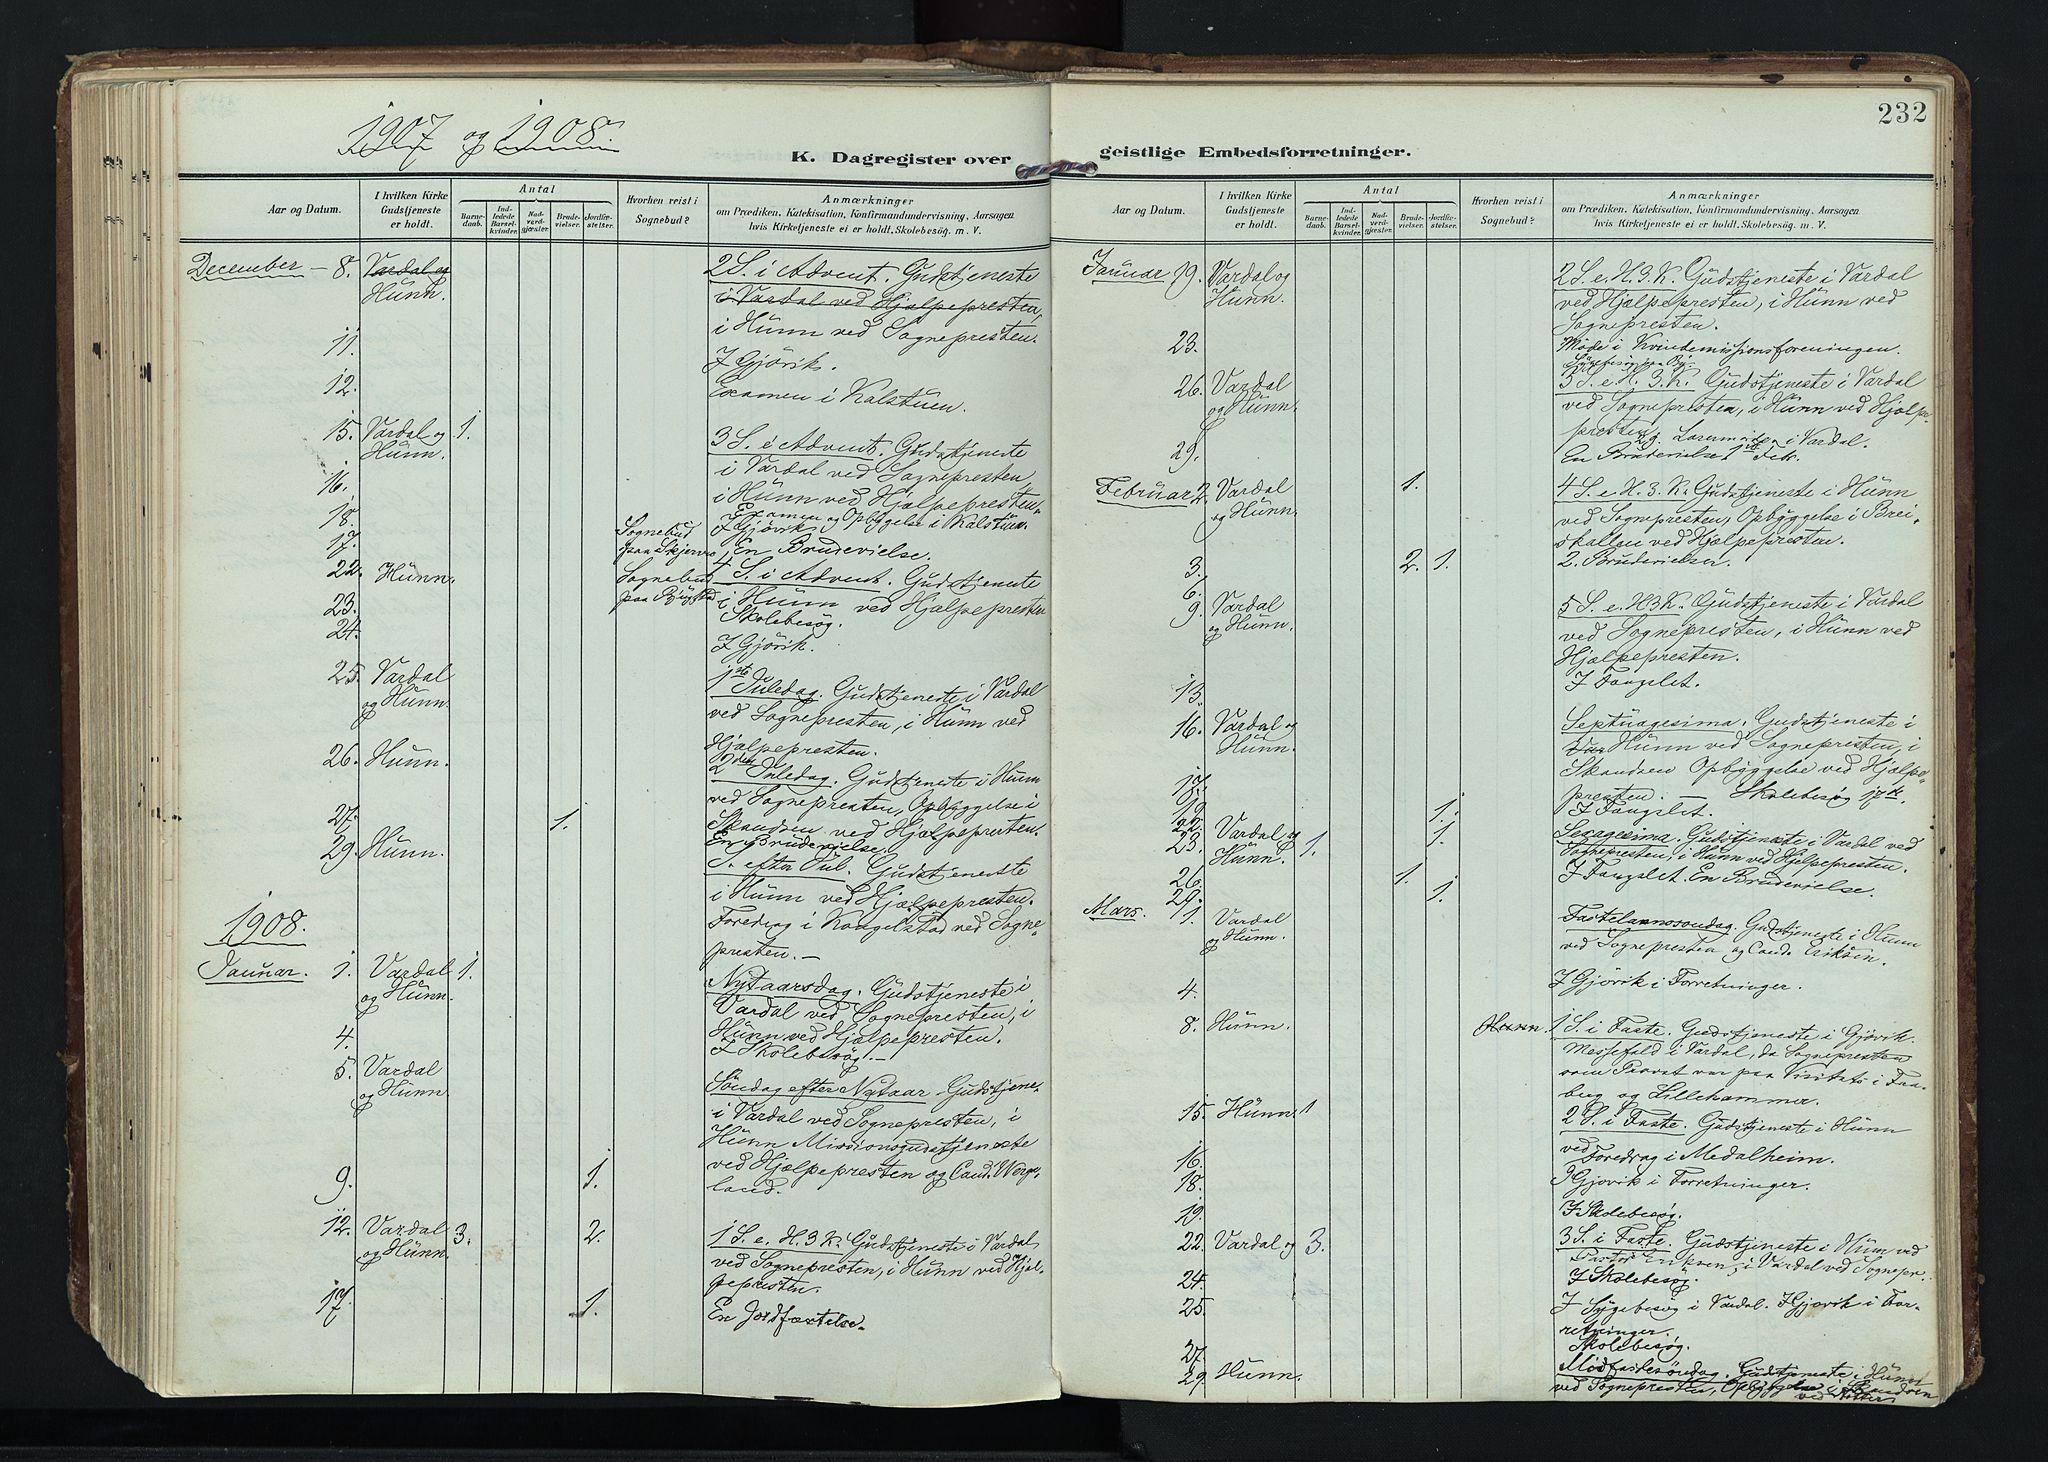 SAH, Vardal prestekontor, H/Ha/Haa/L0020: Ministerialbok nr. 20, 1907-1921, s. 232